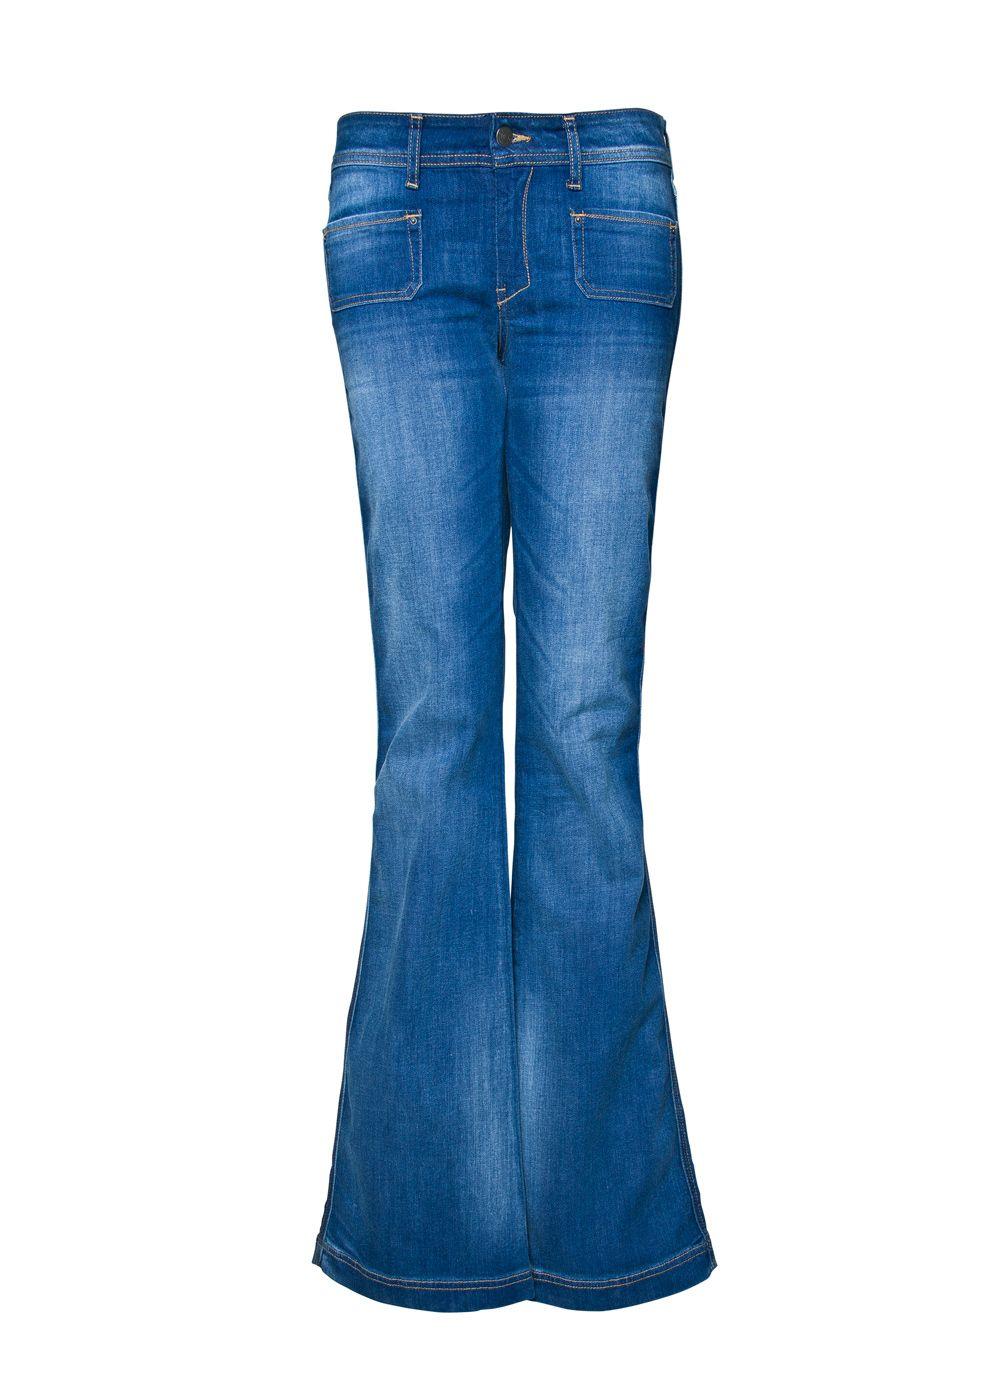 Mango Belt Button Jeans in Denim (Blue)